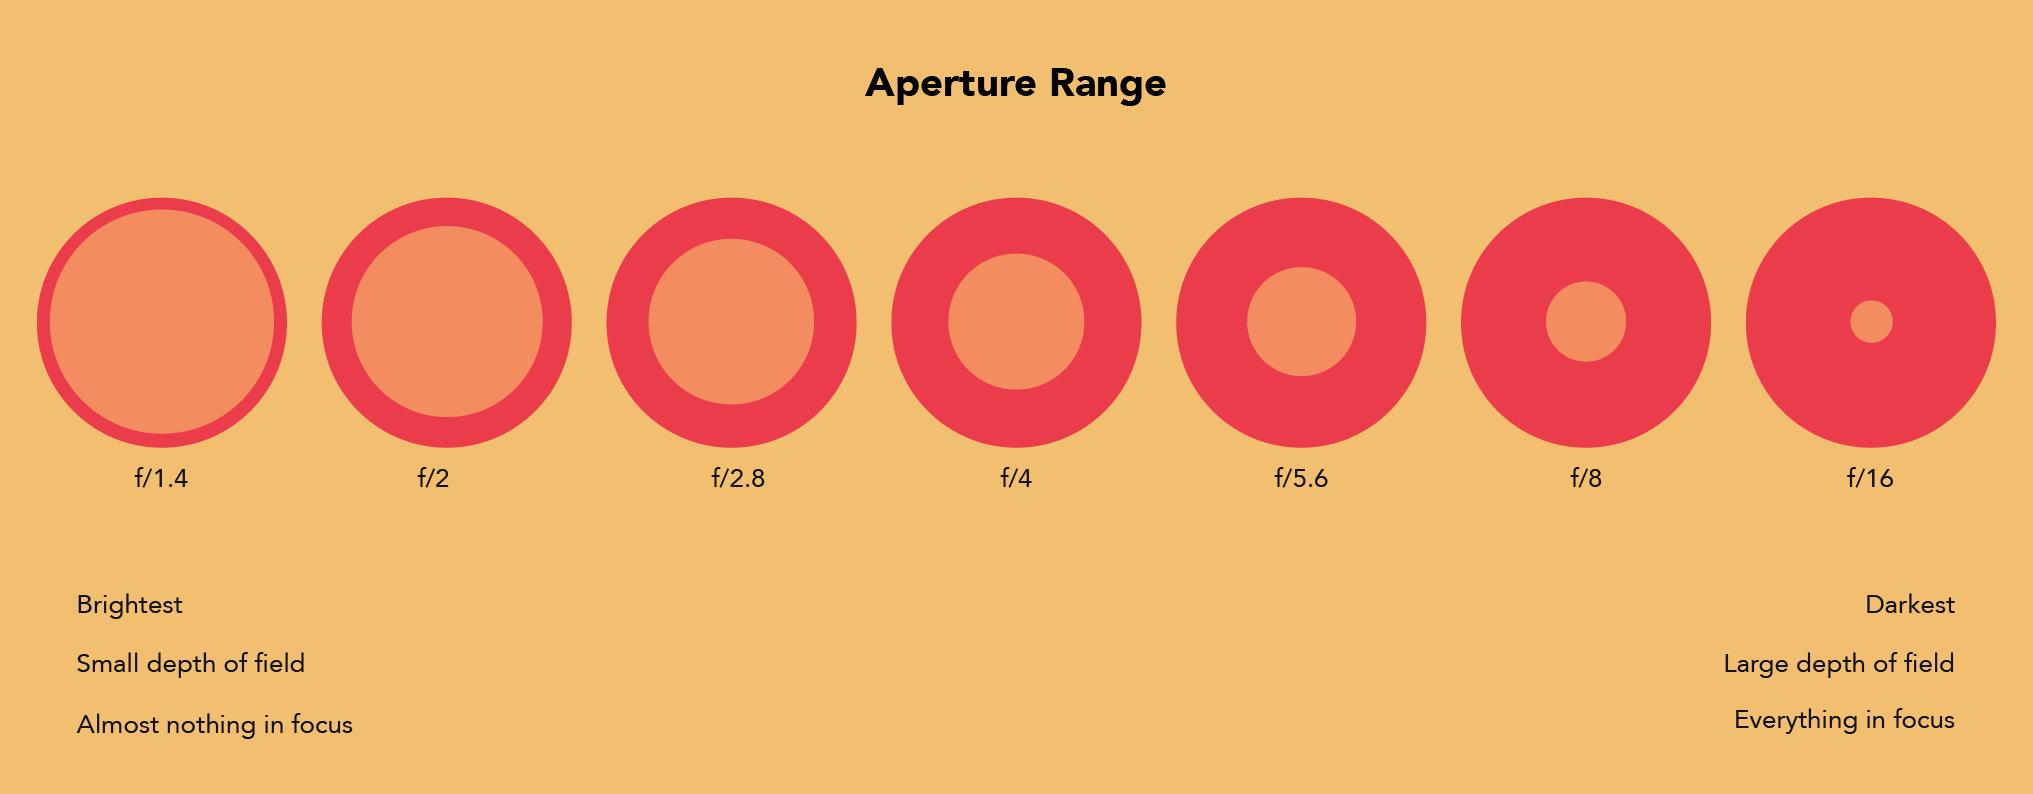 aperature-range.png